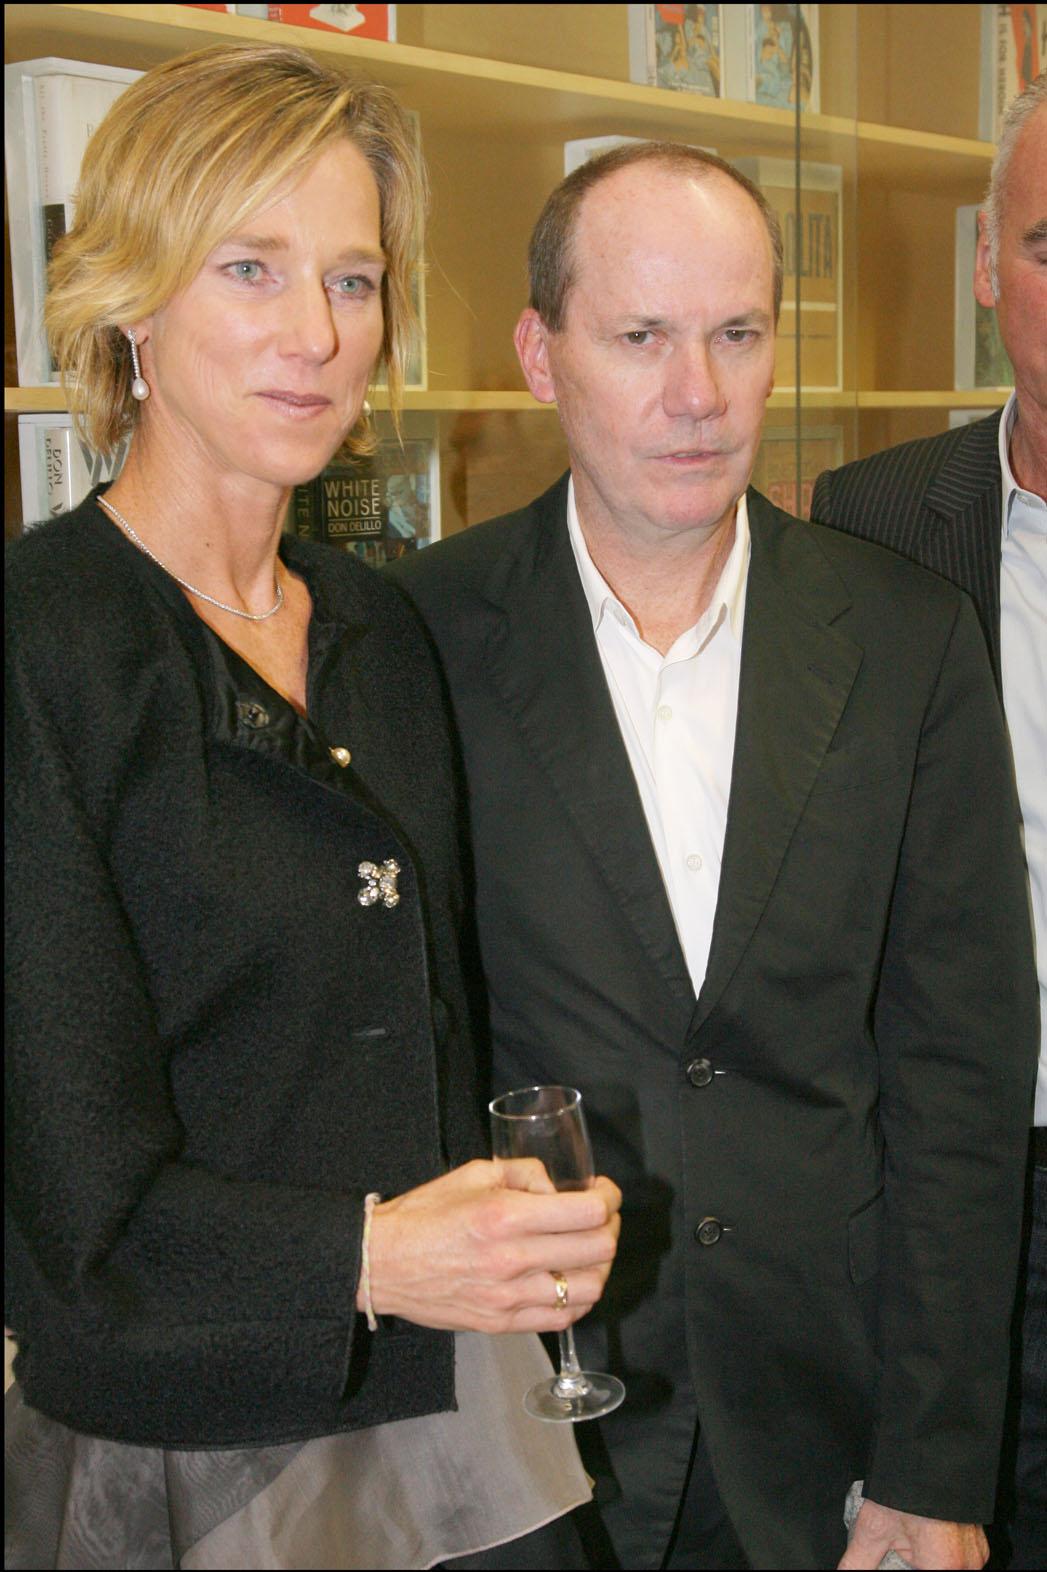 Richard Prince Joelle Grunwald - P 2014